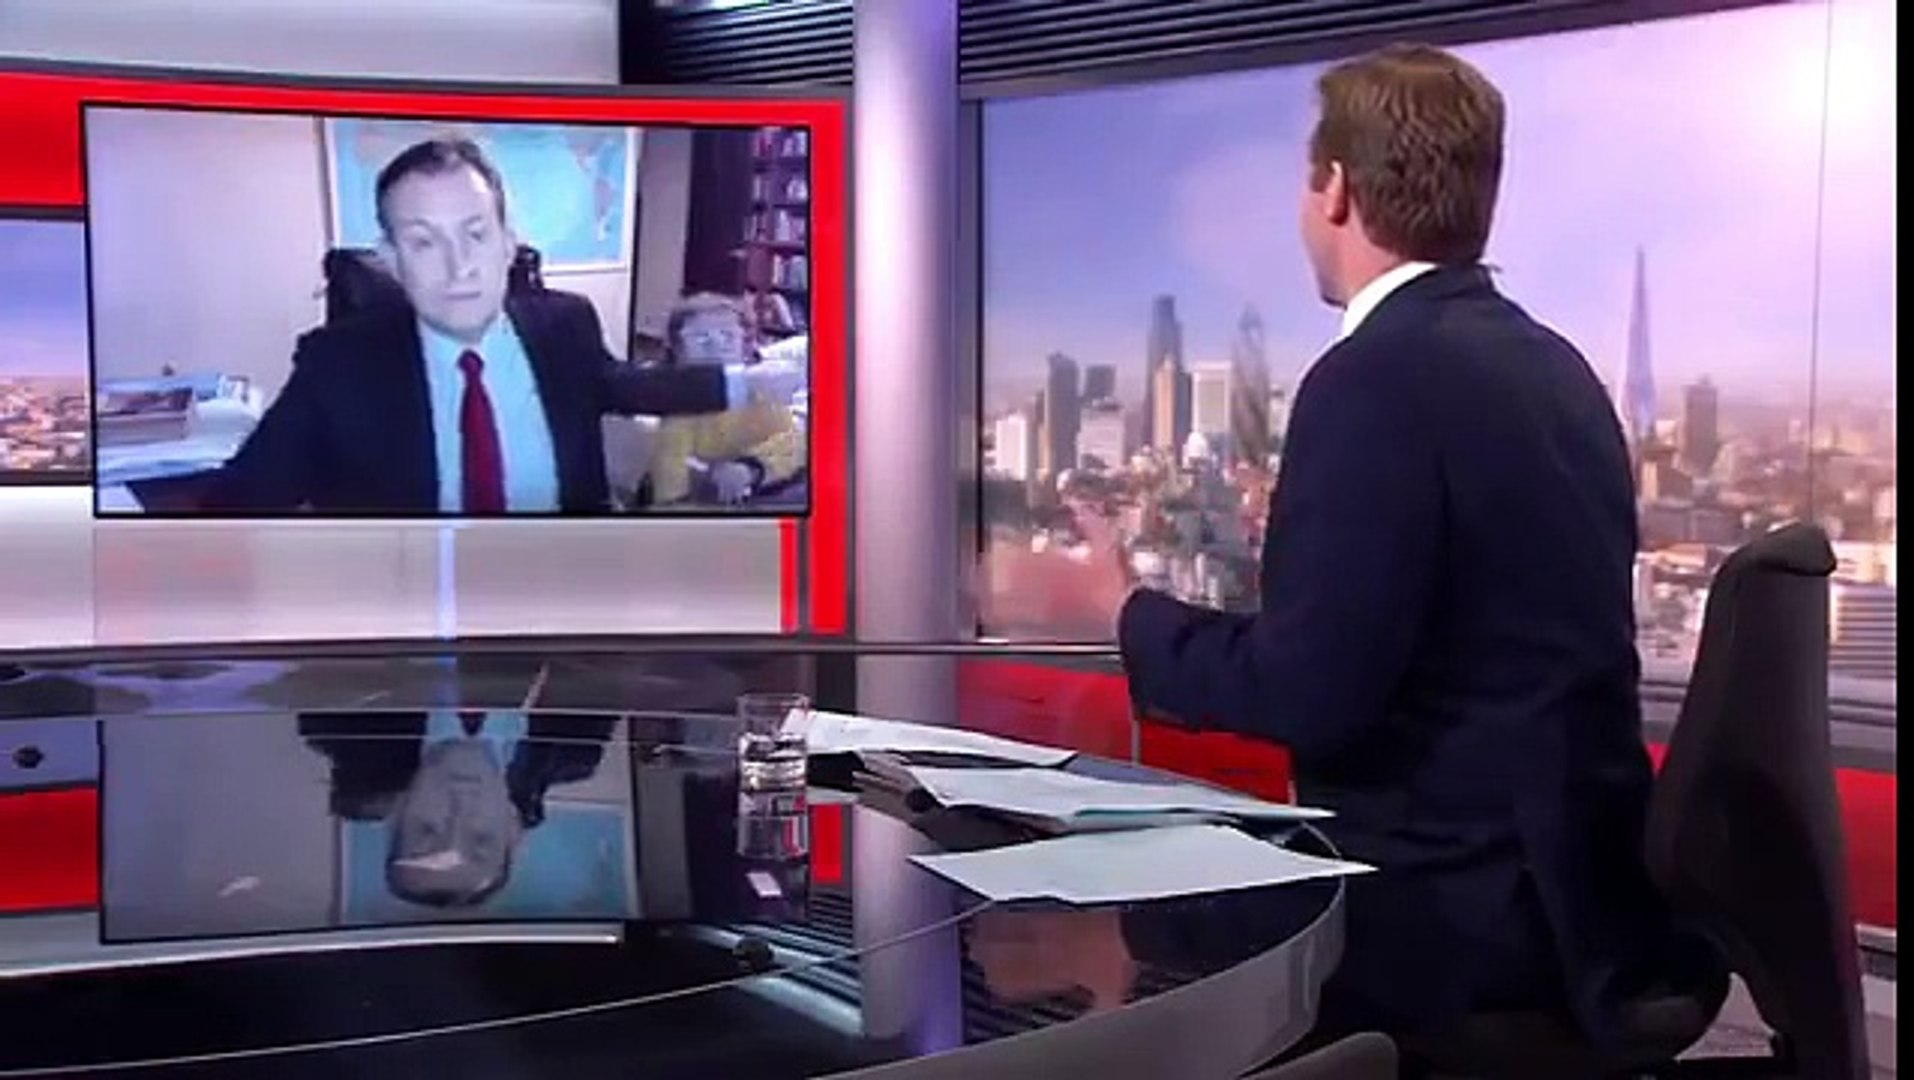 Kids Video Bomb BBC News Interview - BBC News Blooper